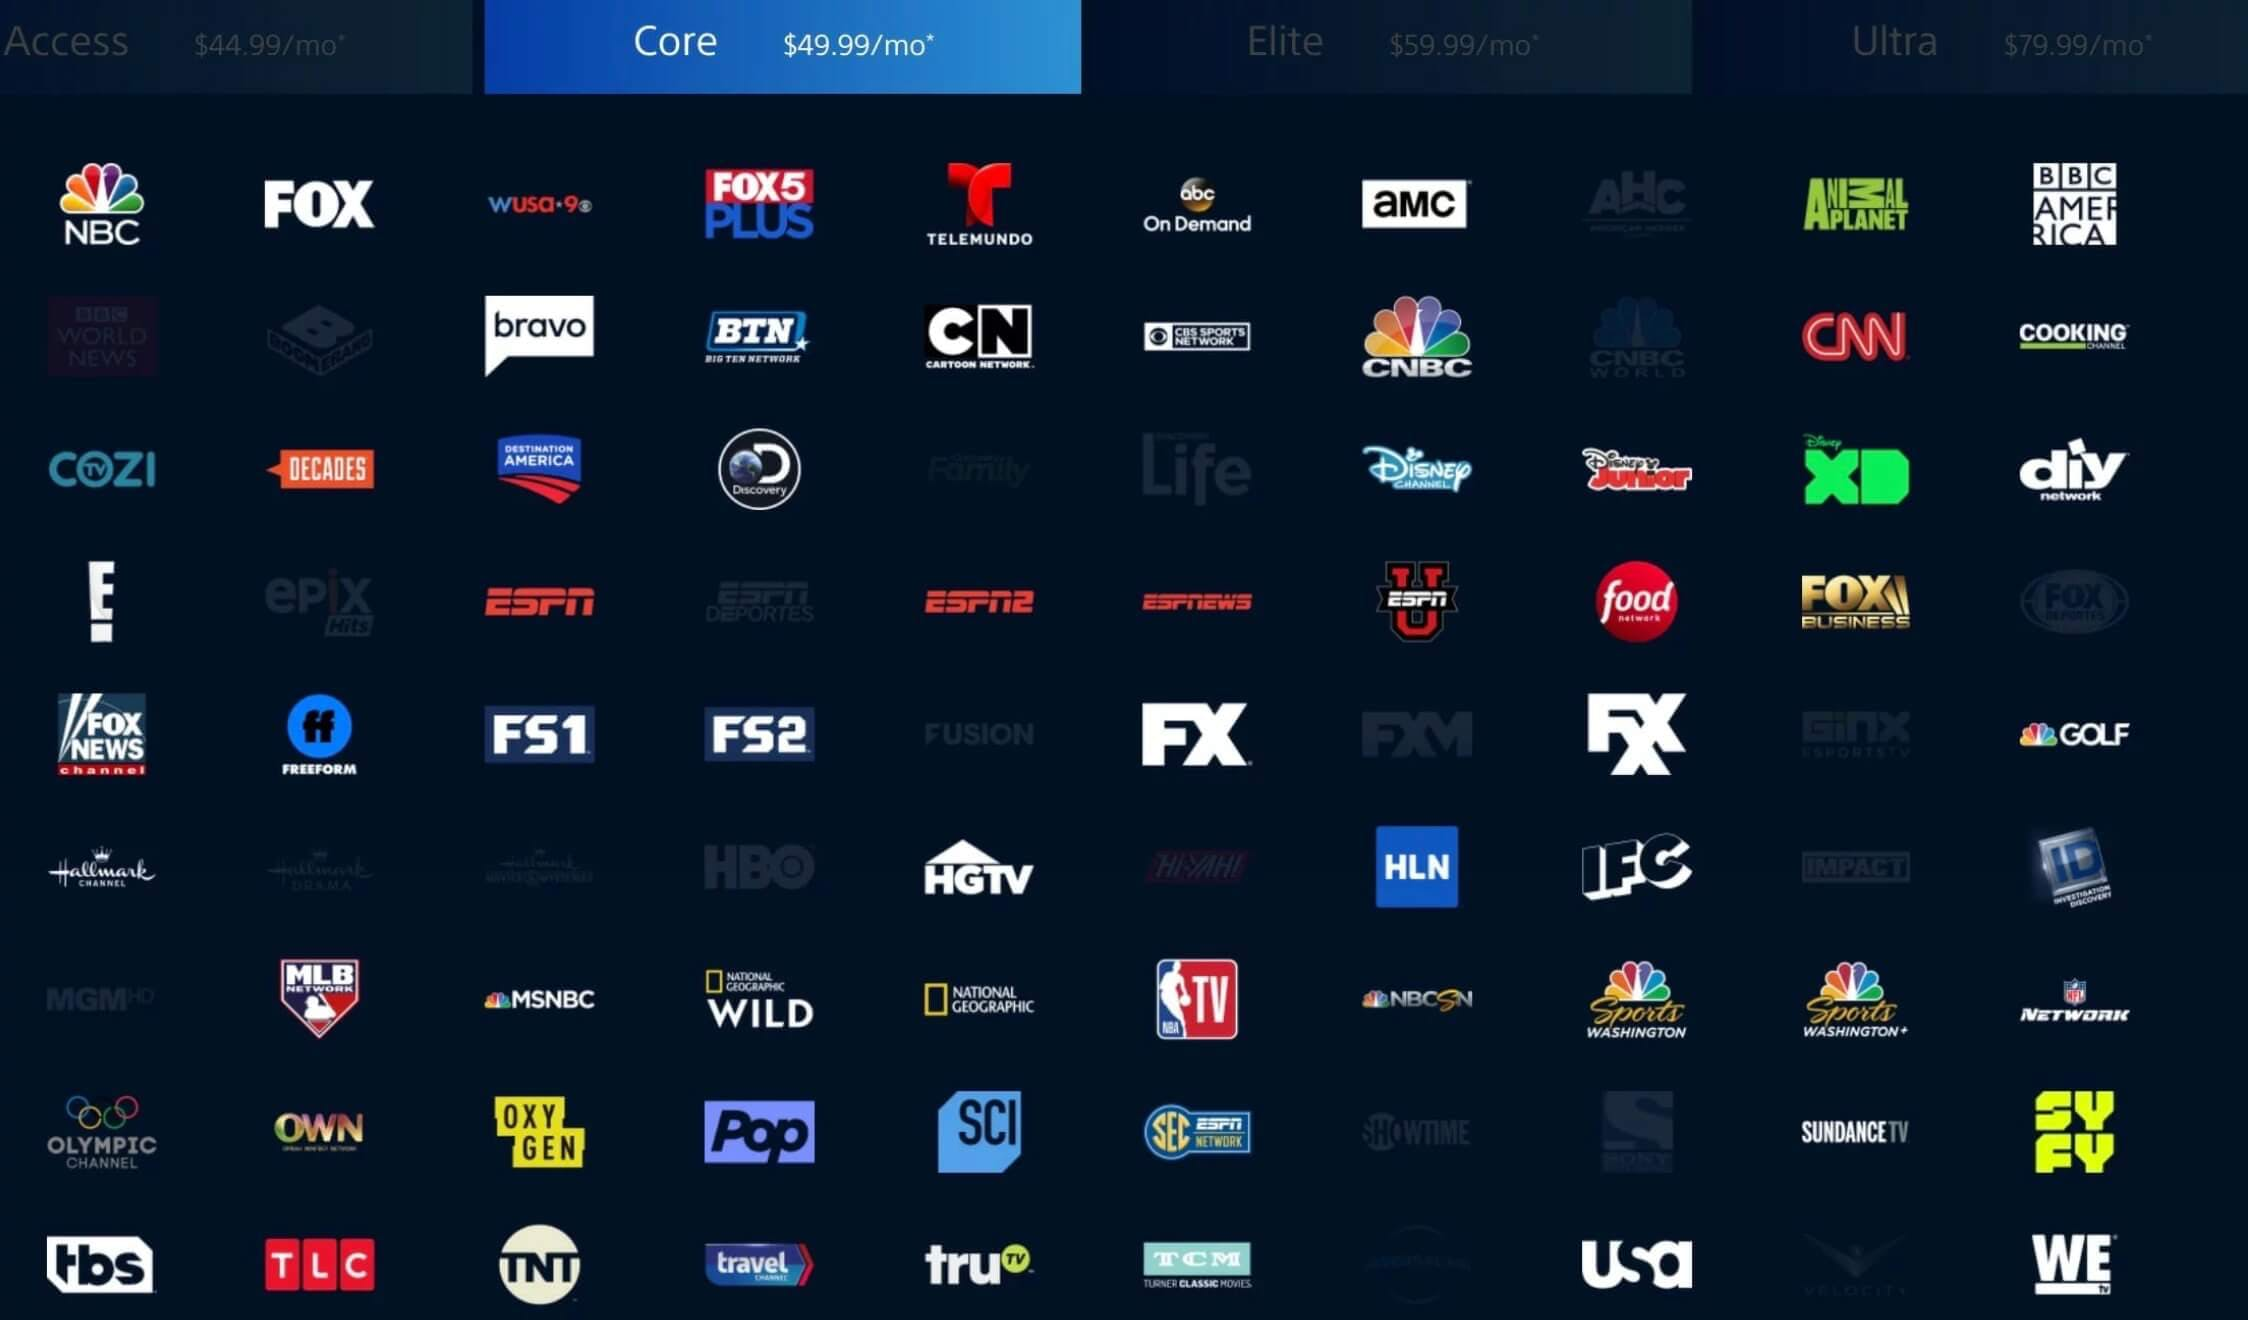 2019-mls-playoffs first round soccer live stream free playstation vue core